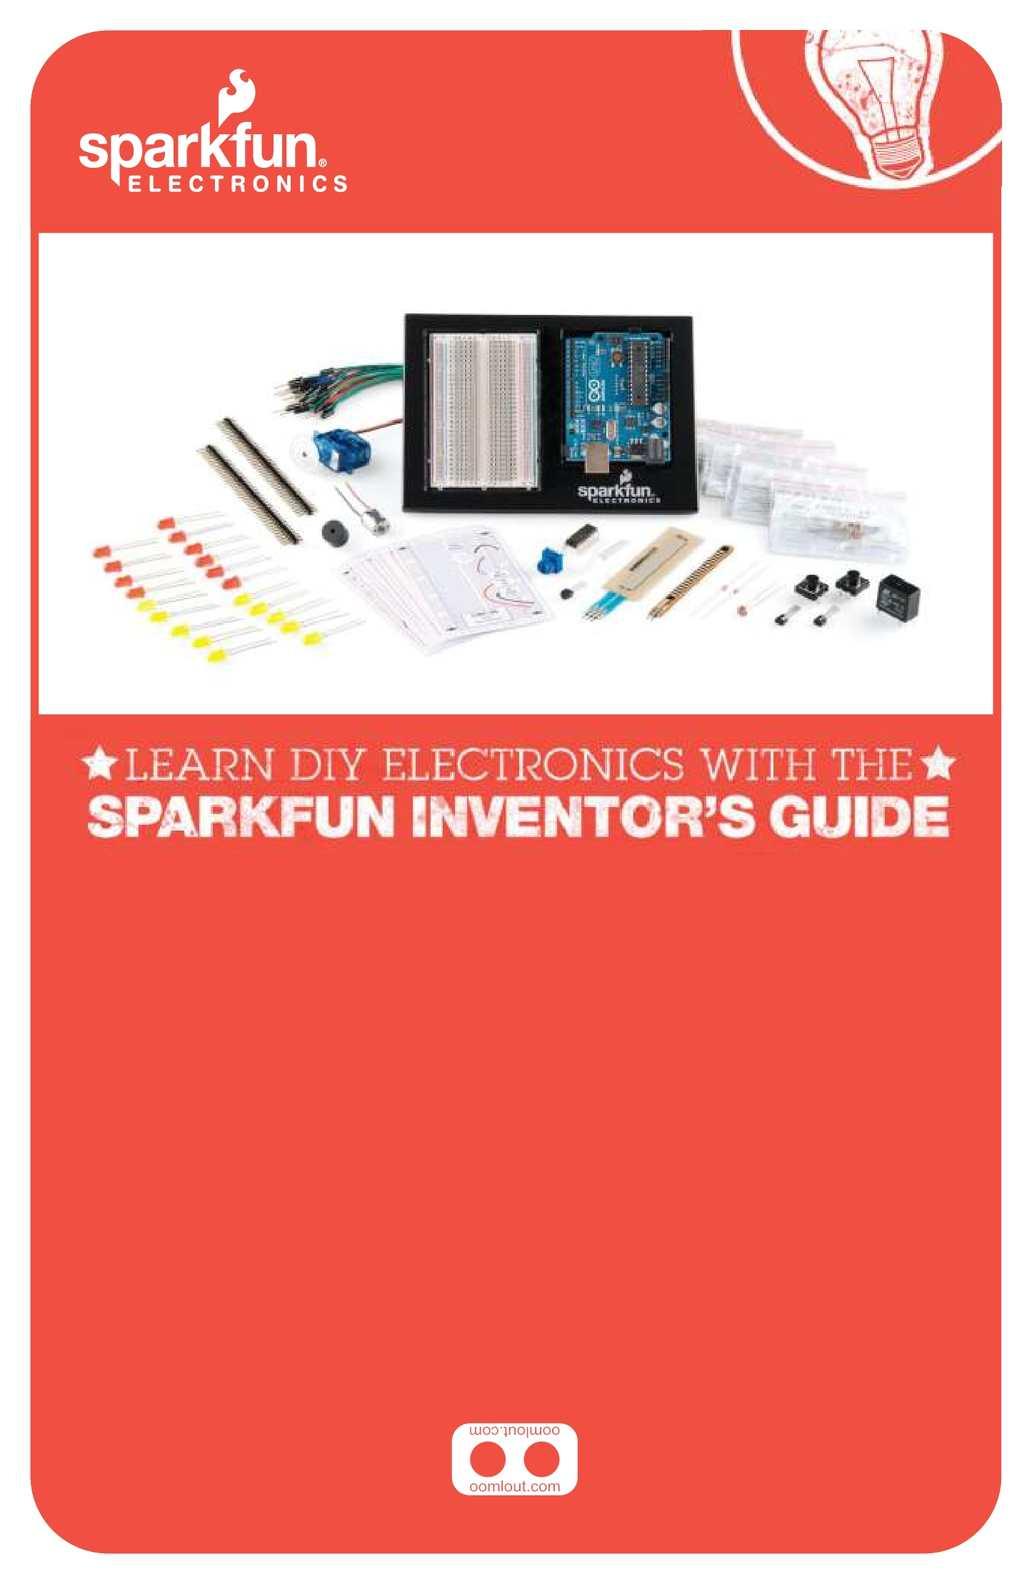 Calamo Sparkfun Inventors Guide Arduino Voltage Divider Circuit For Measure Analog Temperature